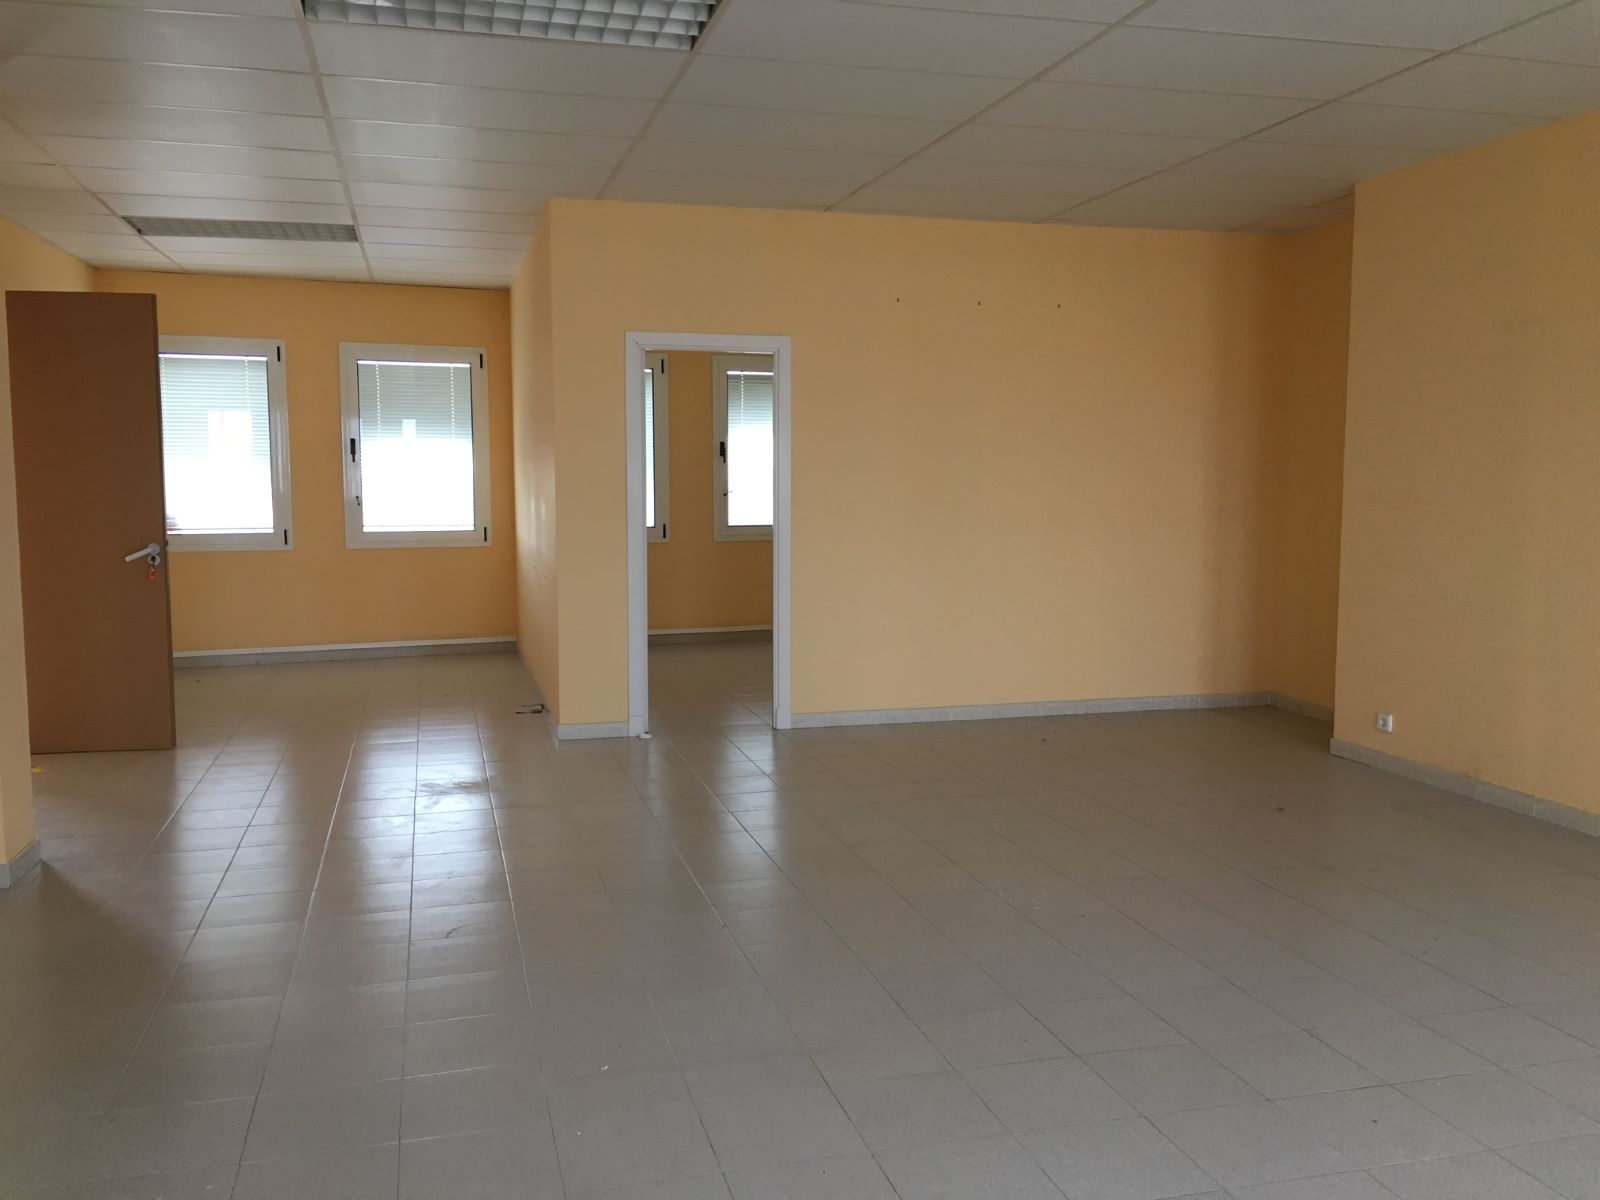 Local comercial en Zona Poligono (Poima) Ref: M7849 2